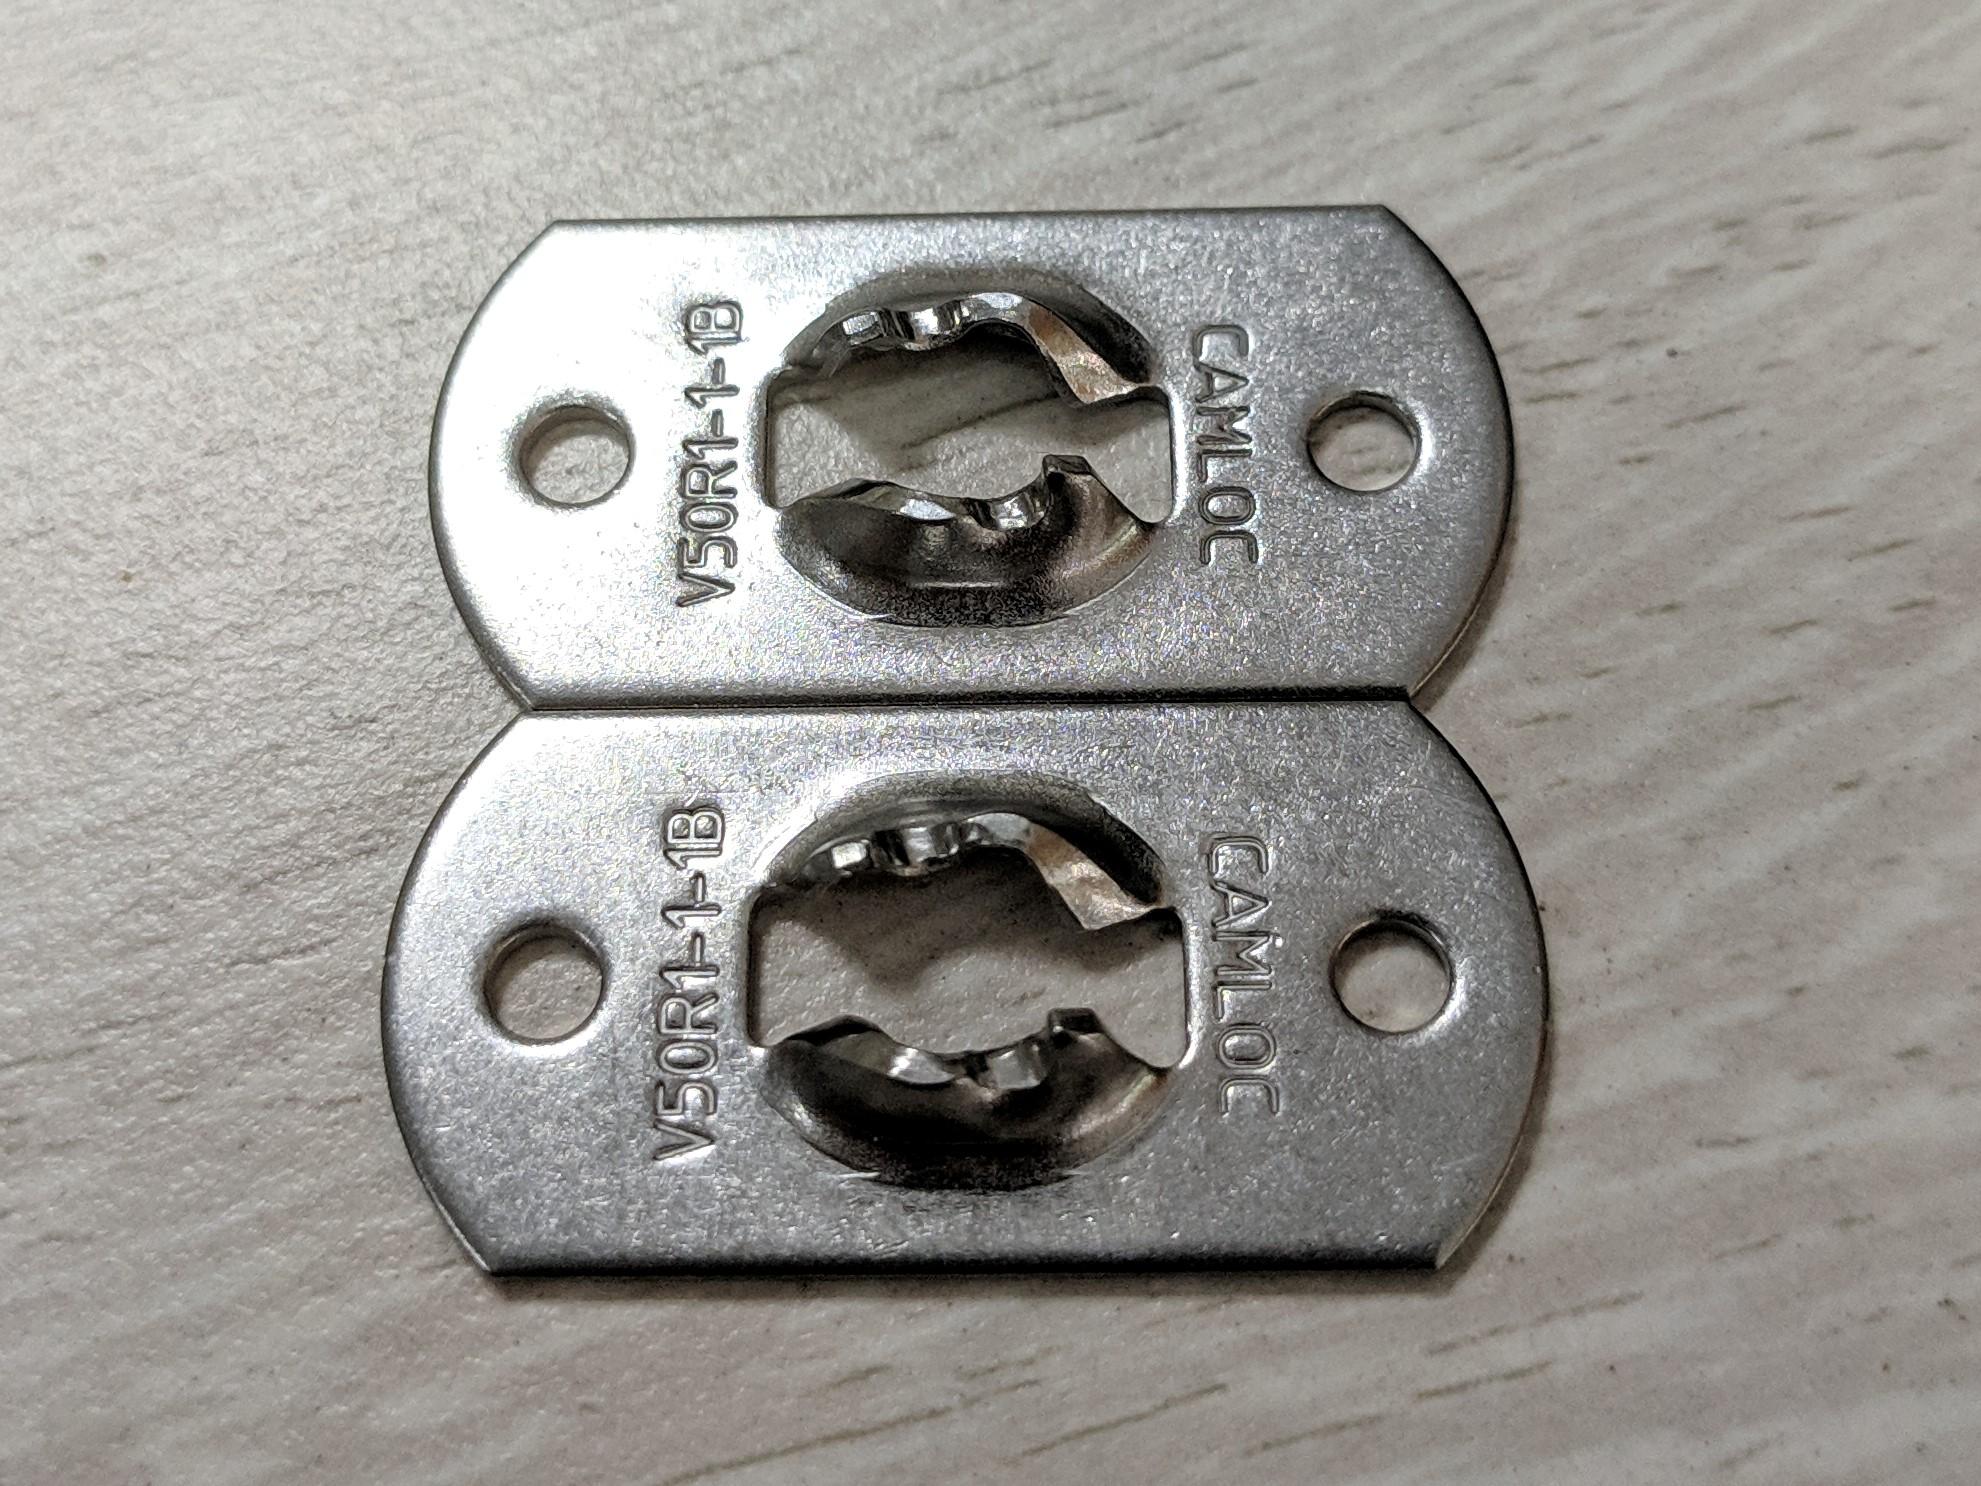 Camloc发动机舱盖锁定销,Camloc面板紧固件 V50R1-1-1BP 四分之一转/直角旋转锁销面板/固定片